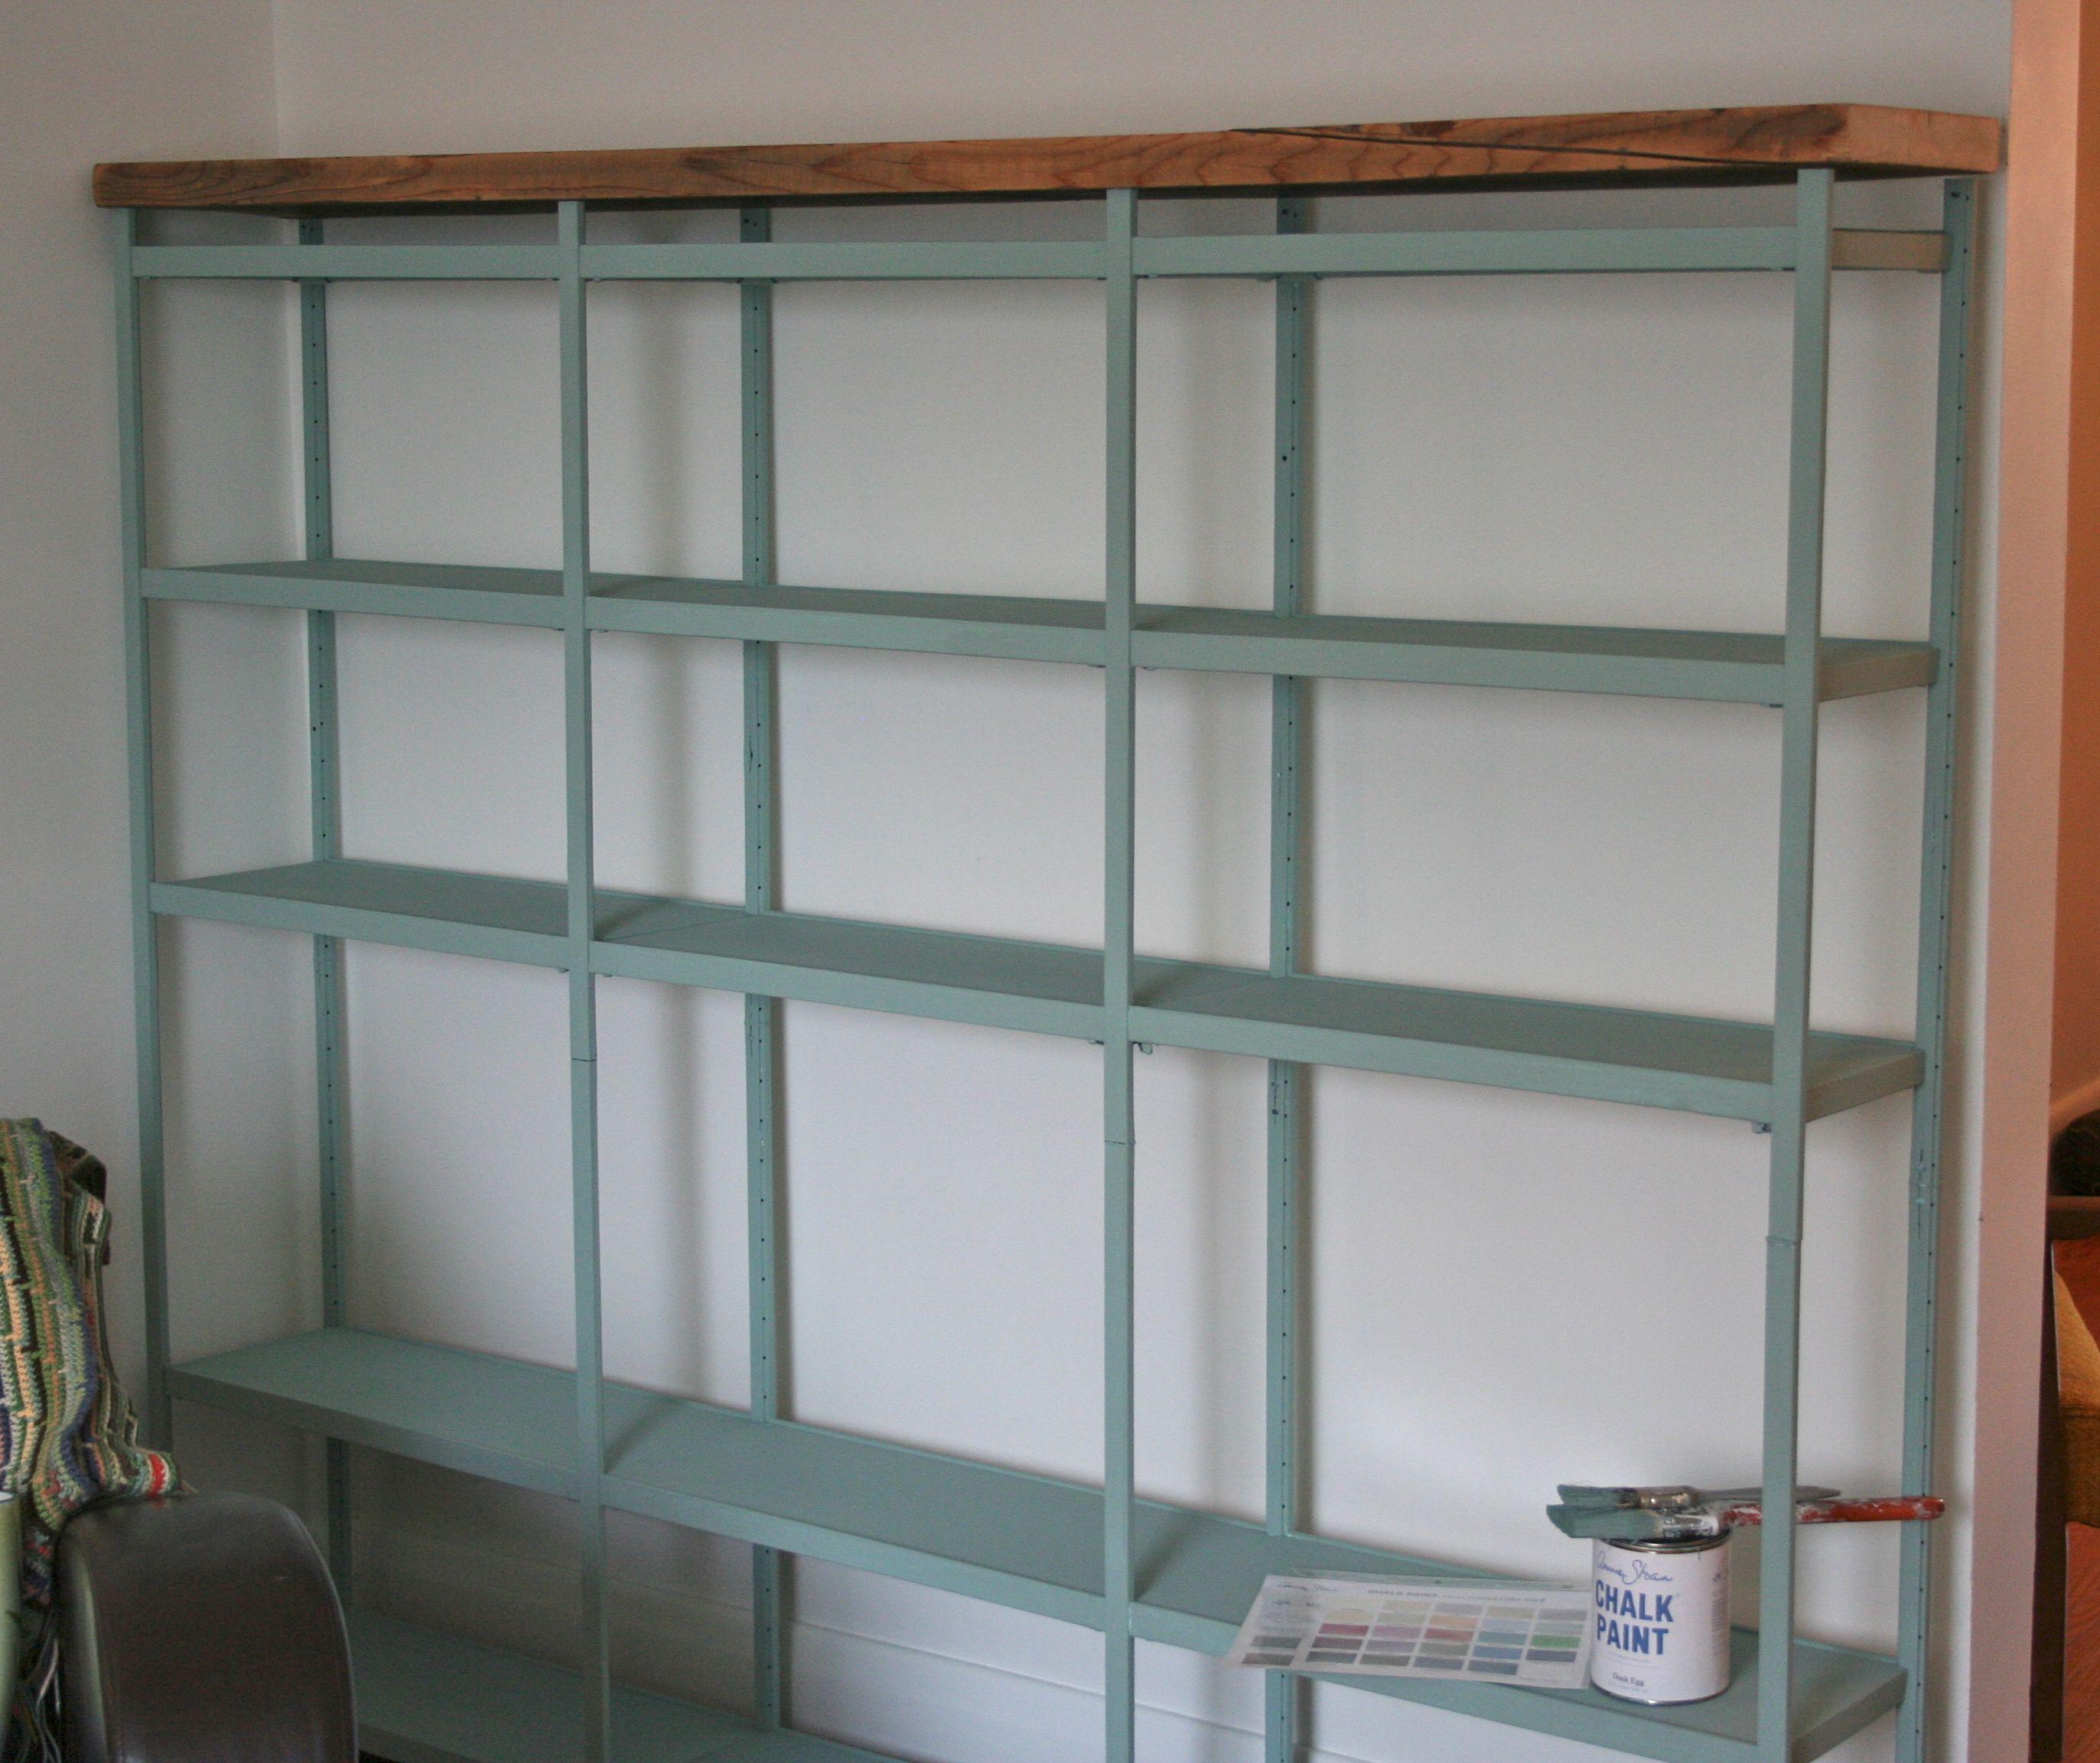 Annie Sloan Chalk Paint Makeover On Metal Shelves Love The Wood Finish Shelf Makeover Metal Furniture Design Metal Shelves